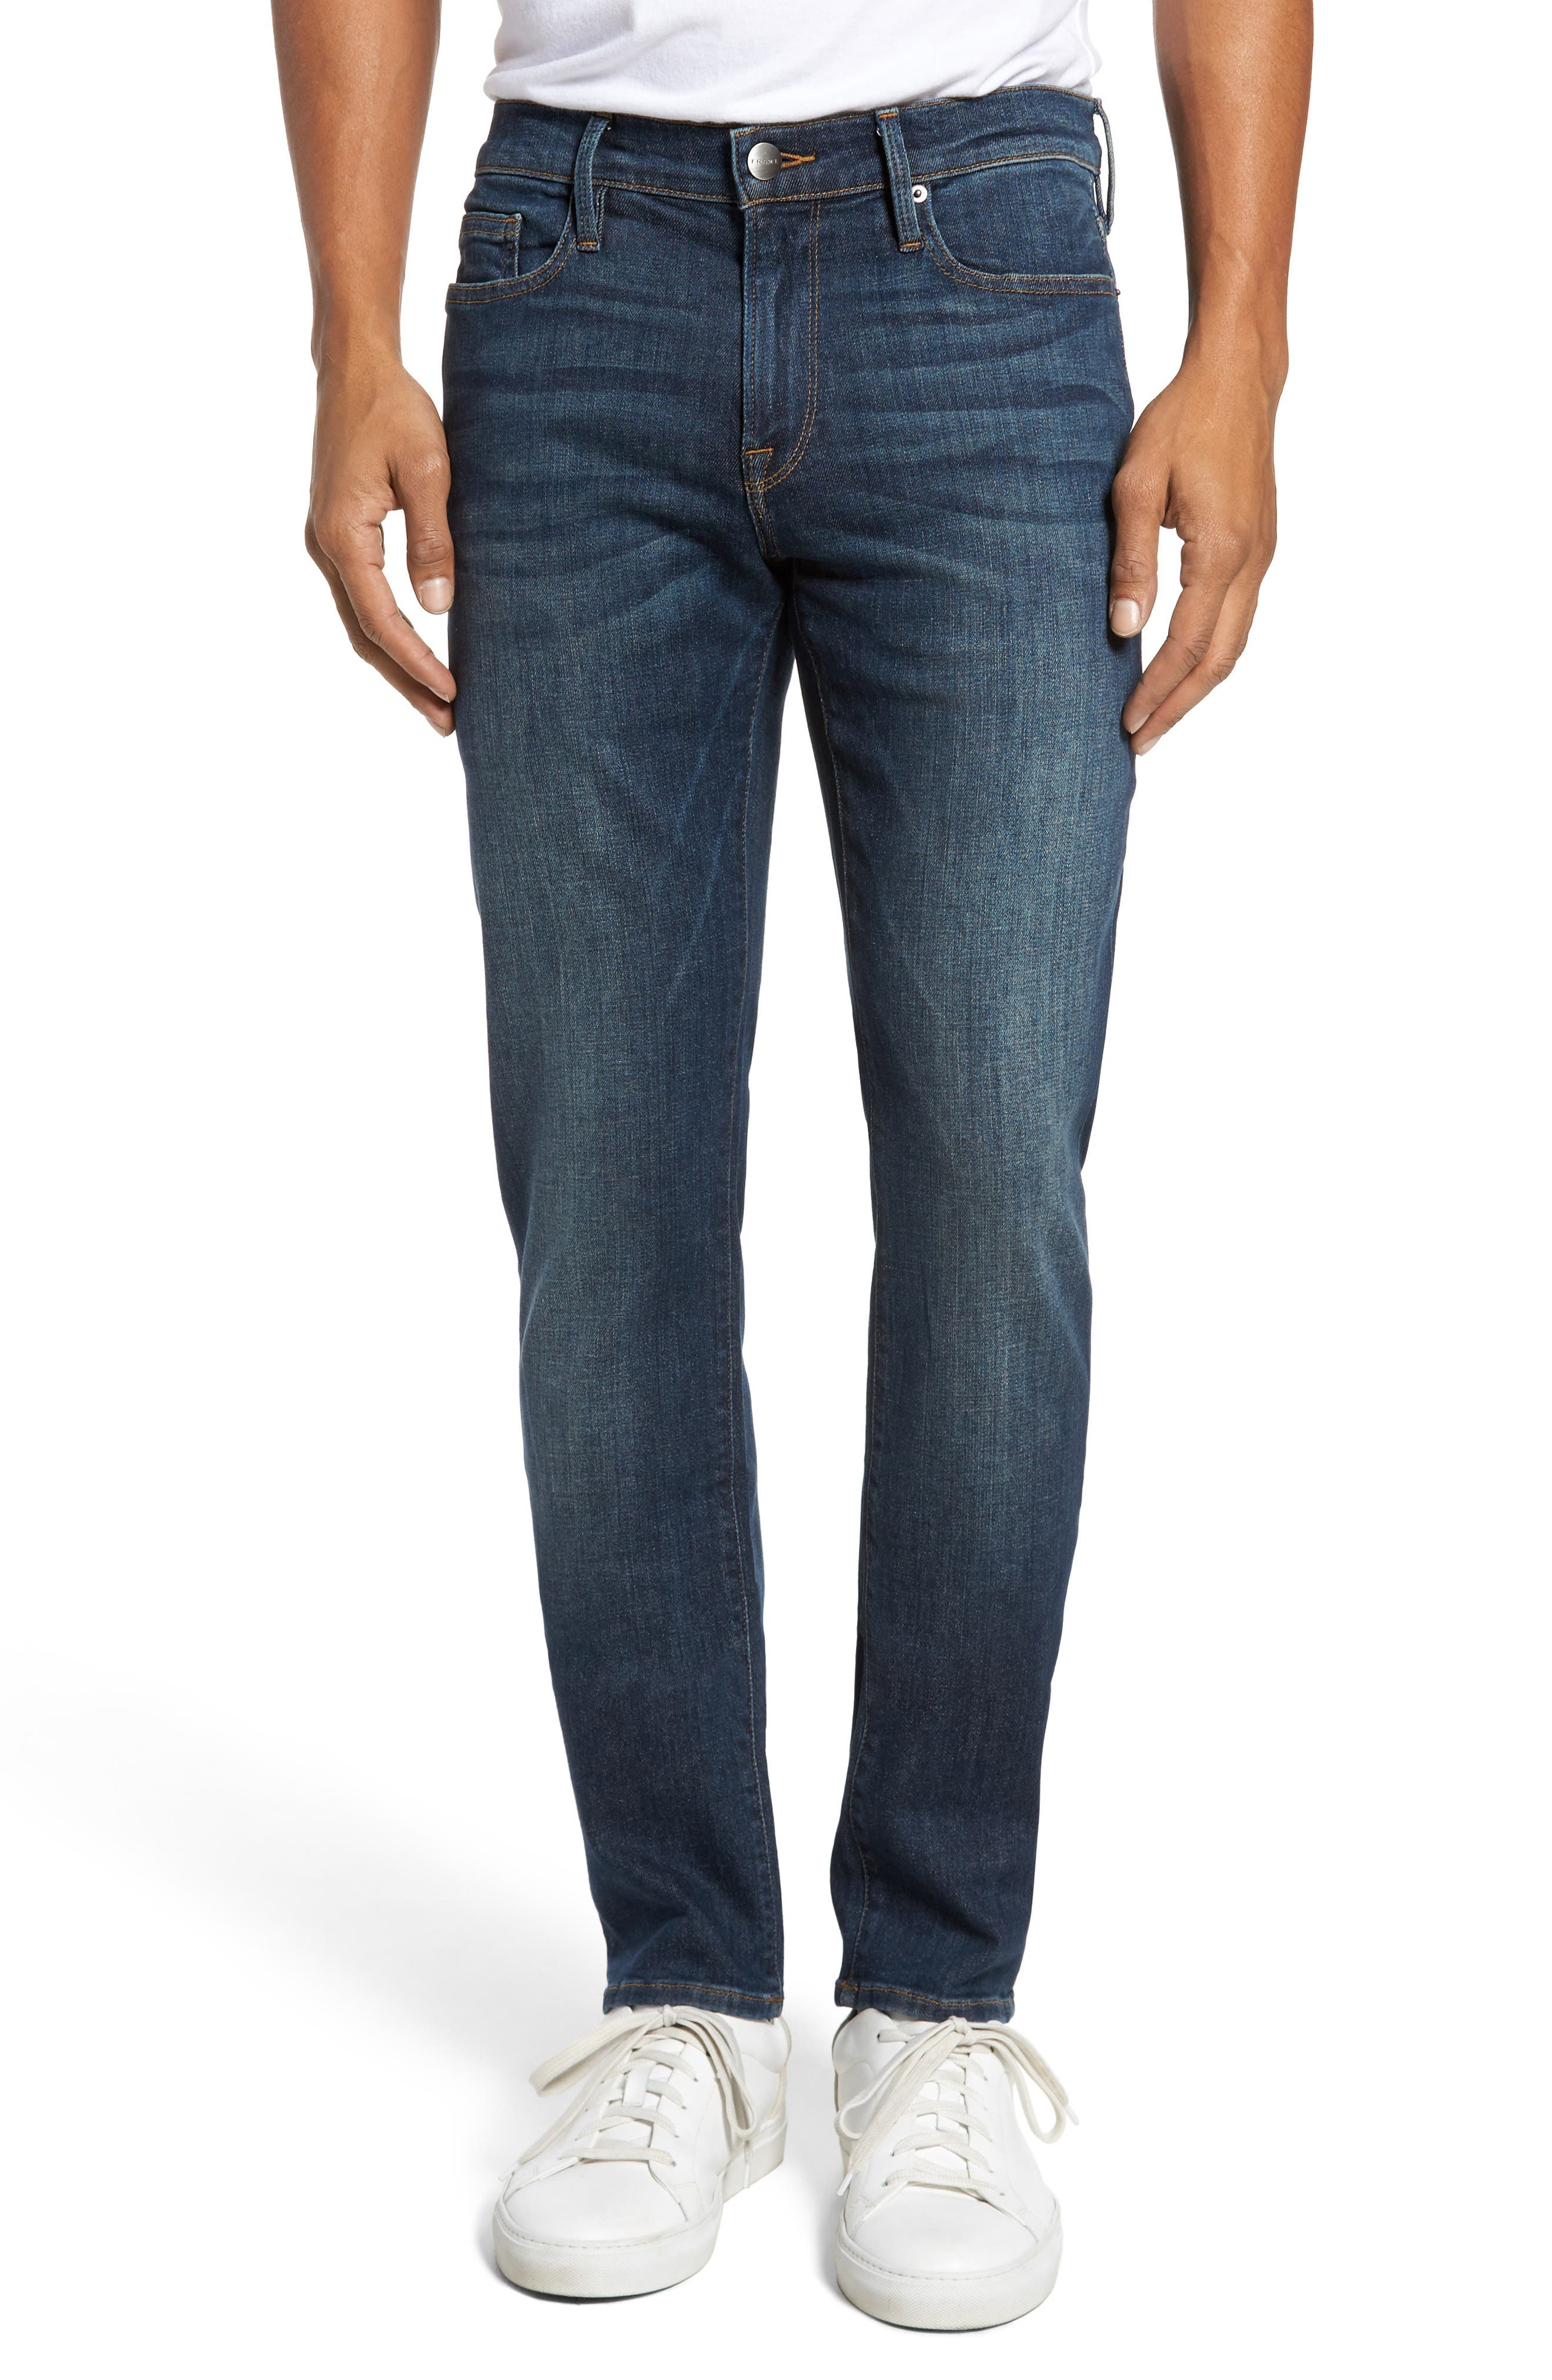 FRAME L'Homme Slim Fit Jeans (Midway Park)